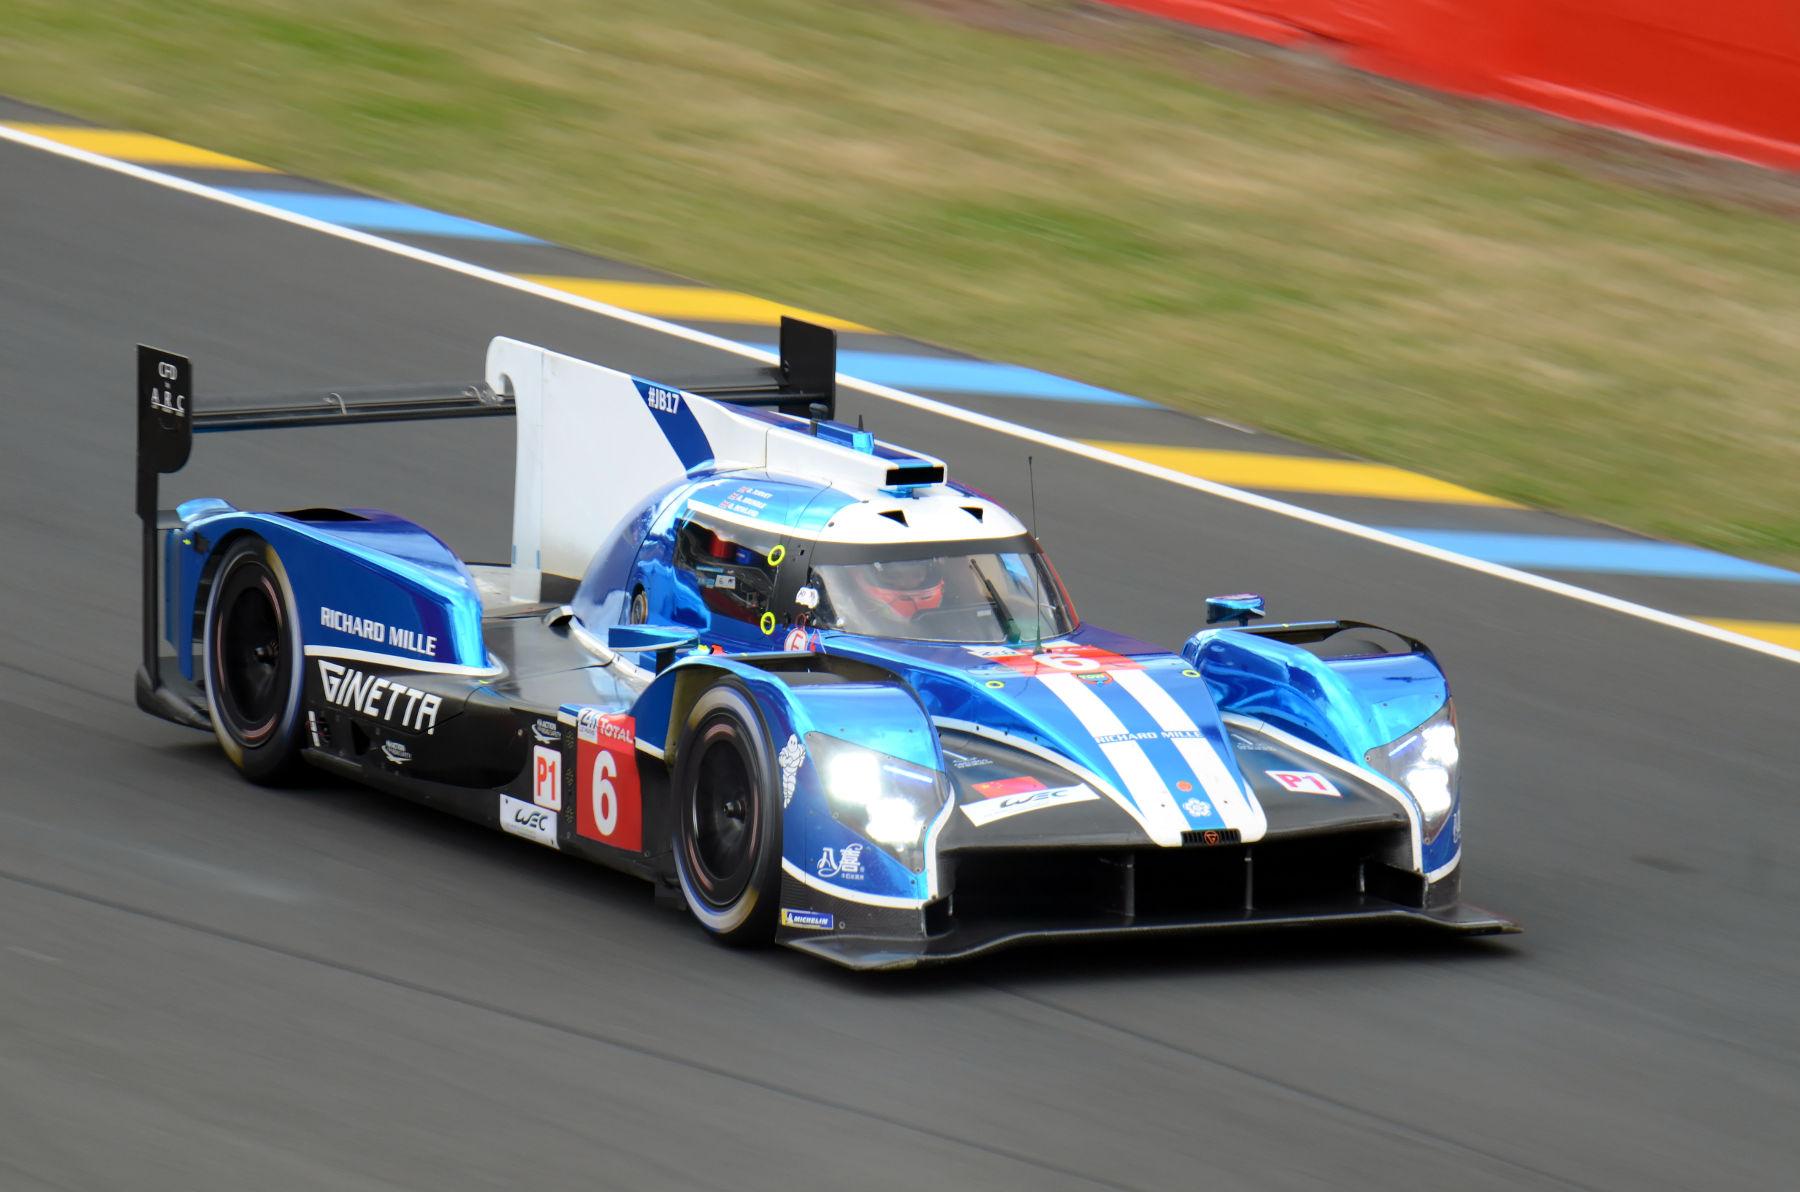 Ginetta_G60-LT-P1-_Mecachrome_-_Team_CEFC_TRSM_Racing_-_24_Hours_of_Le_Mans_2018.jpg